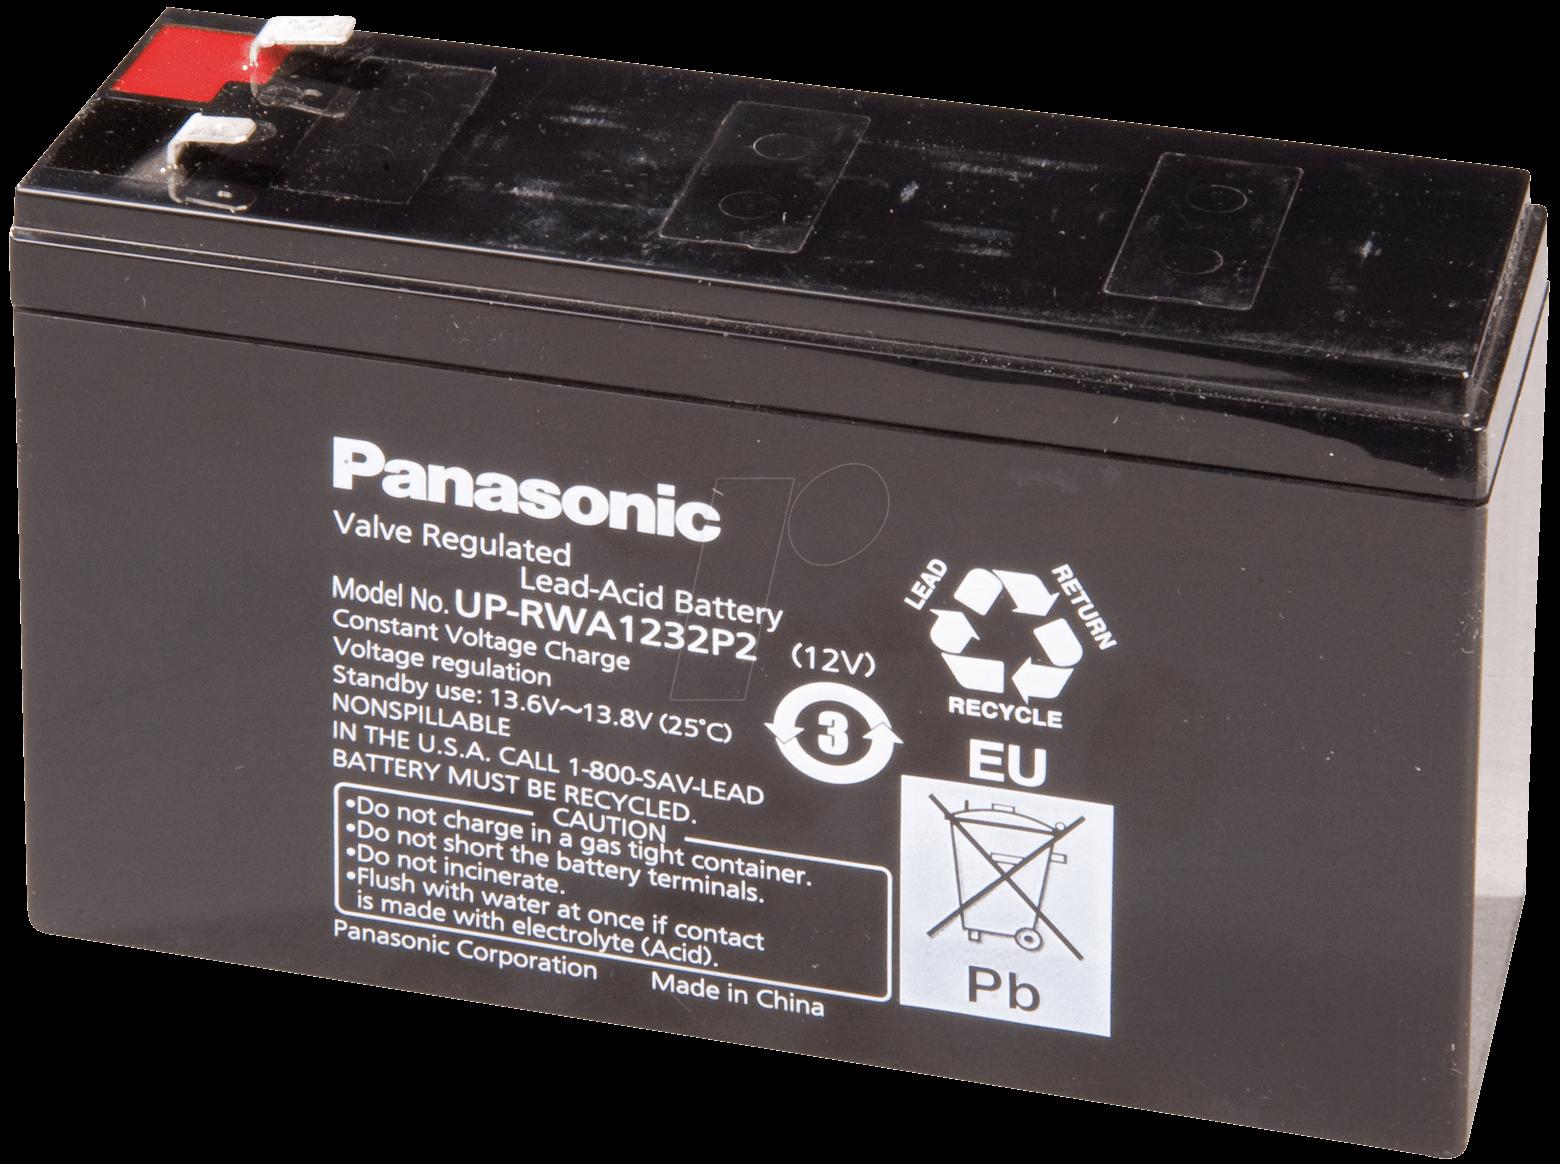 Image result for Panasonic UP-VWA 1232P2